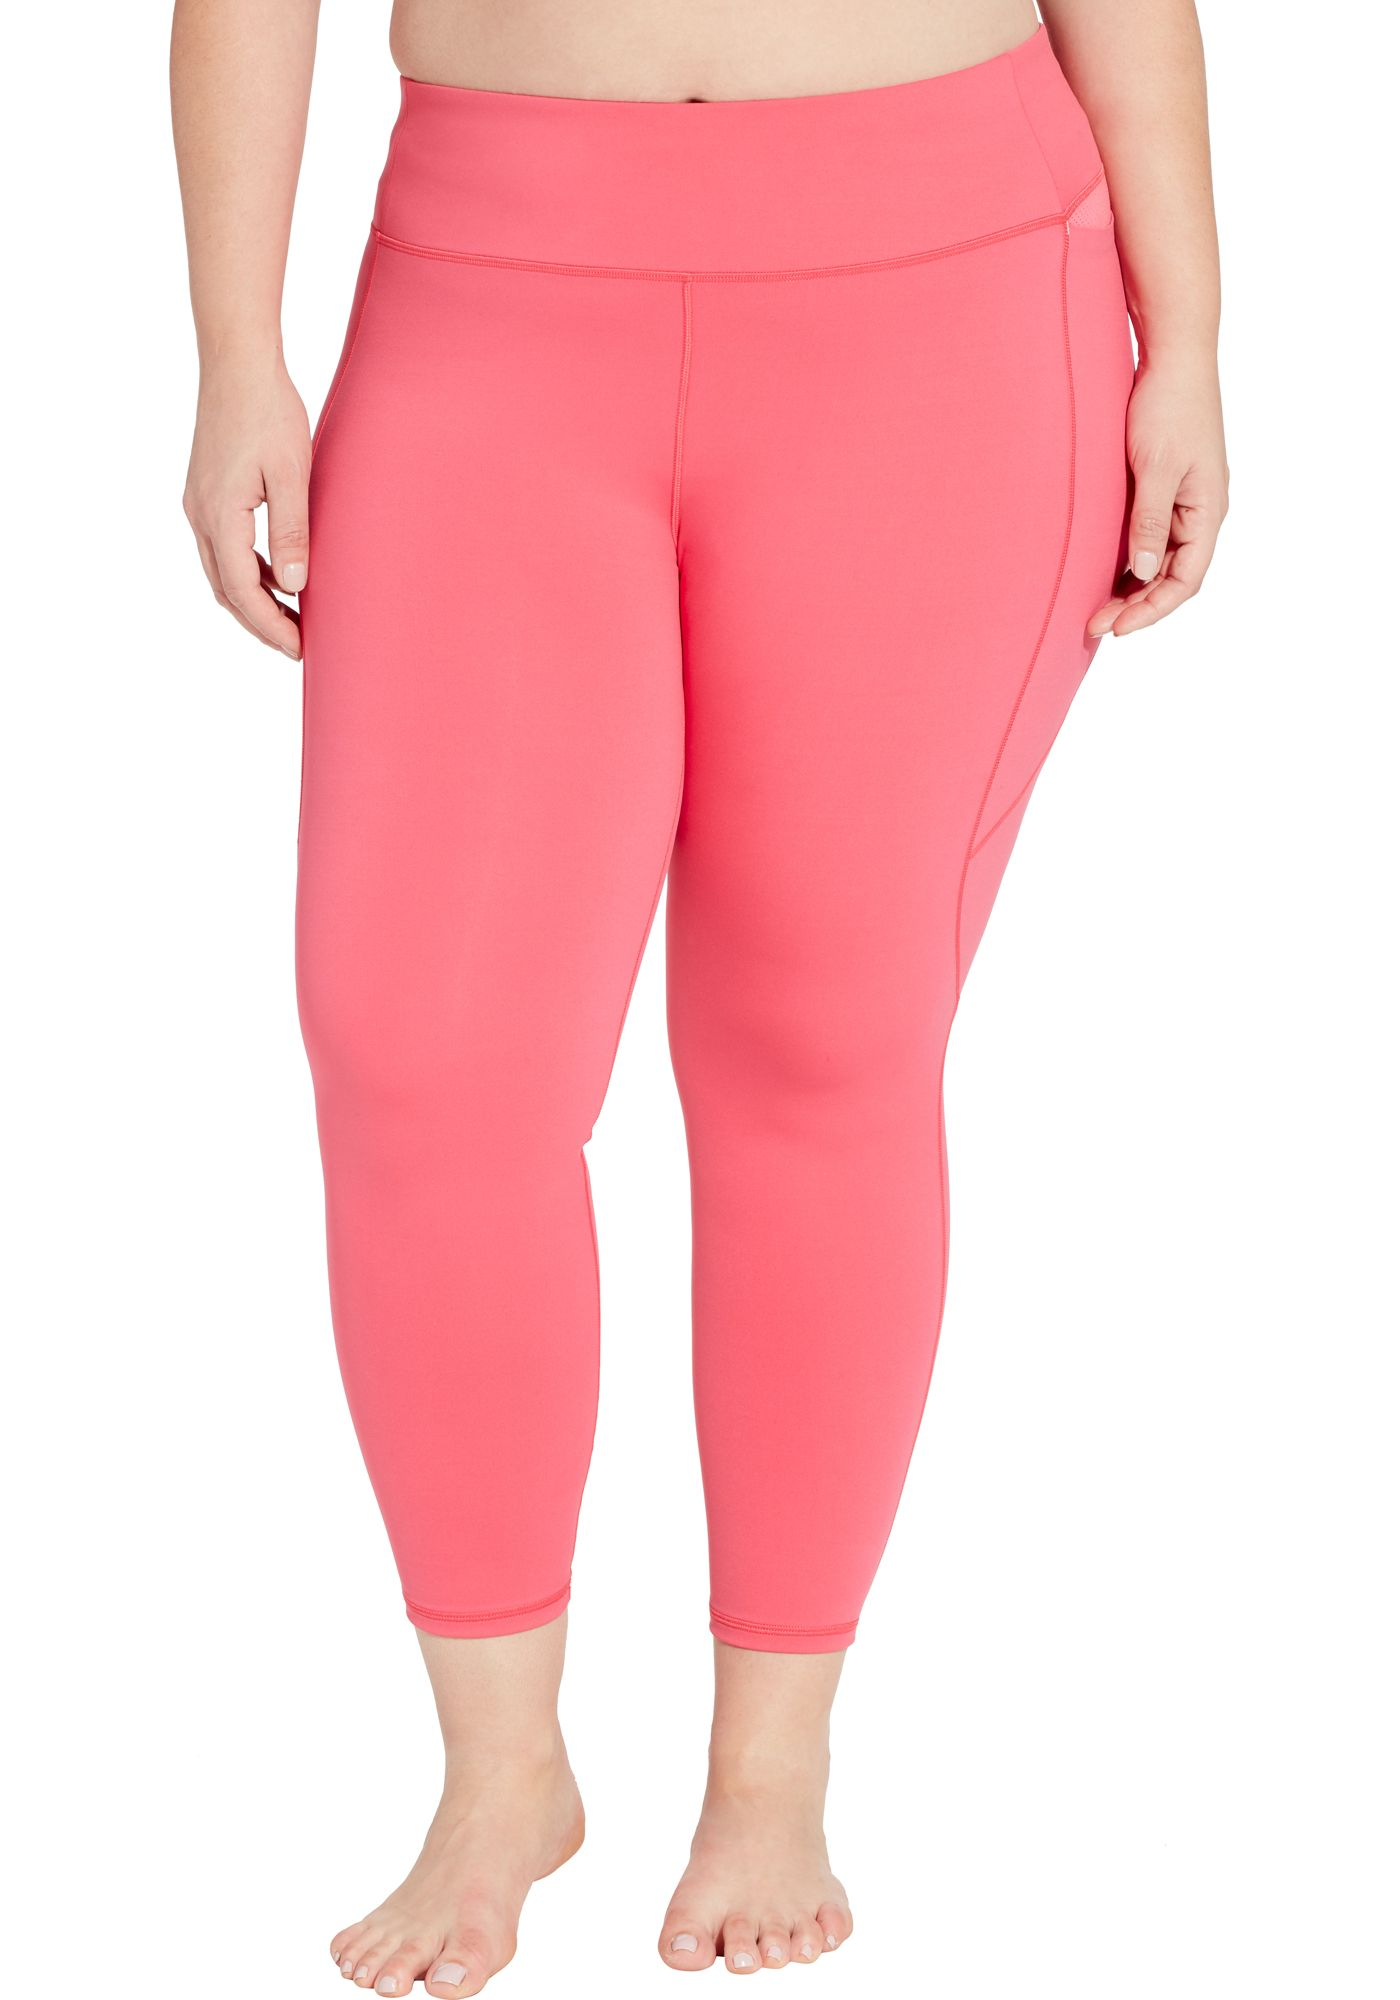 CALIA by Carrie Underwood Women's Plus Size Energize 7/8 Leggings